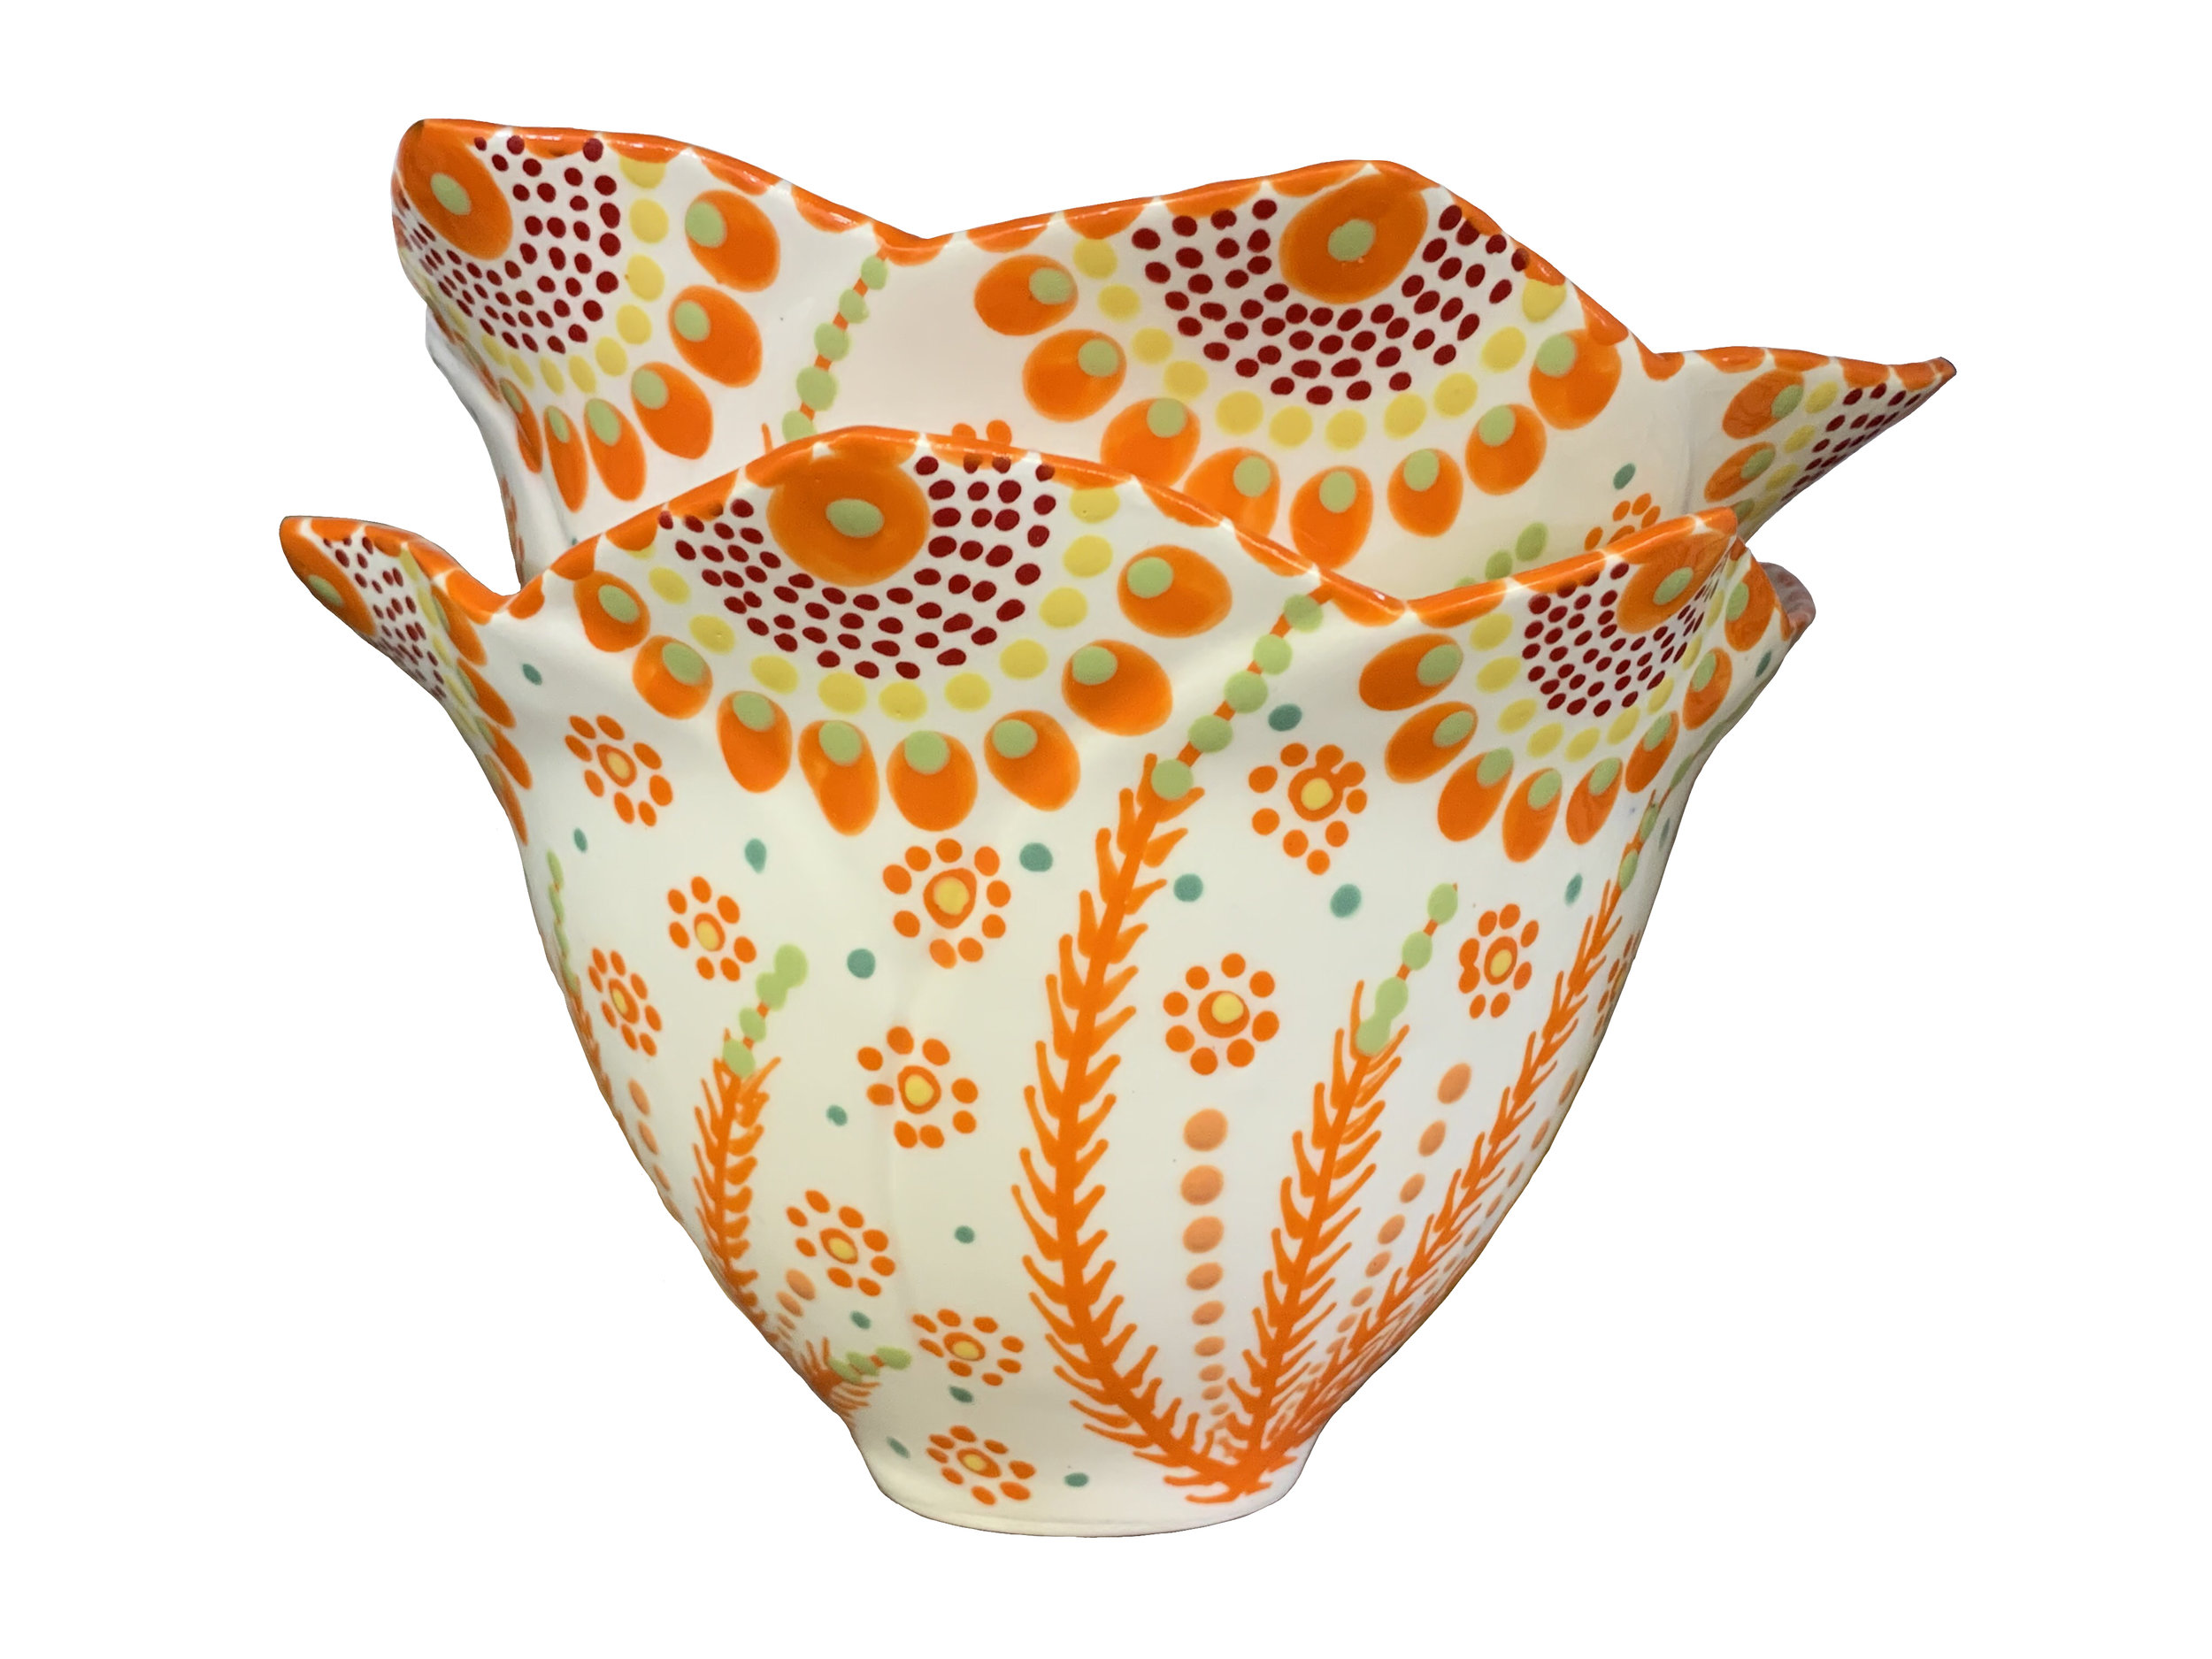 SQ.potters.orange.jpg